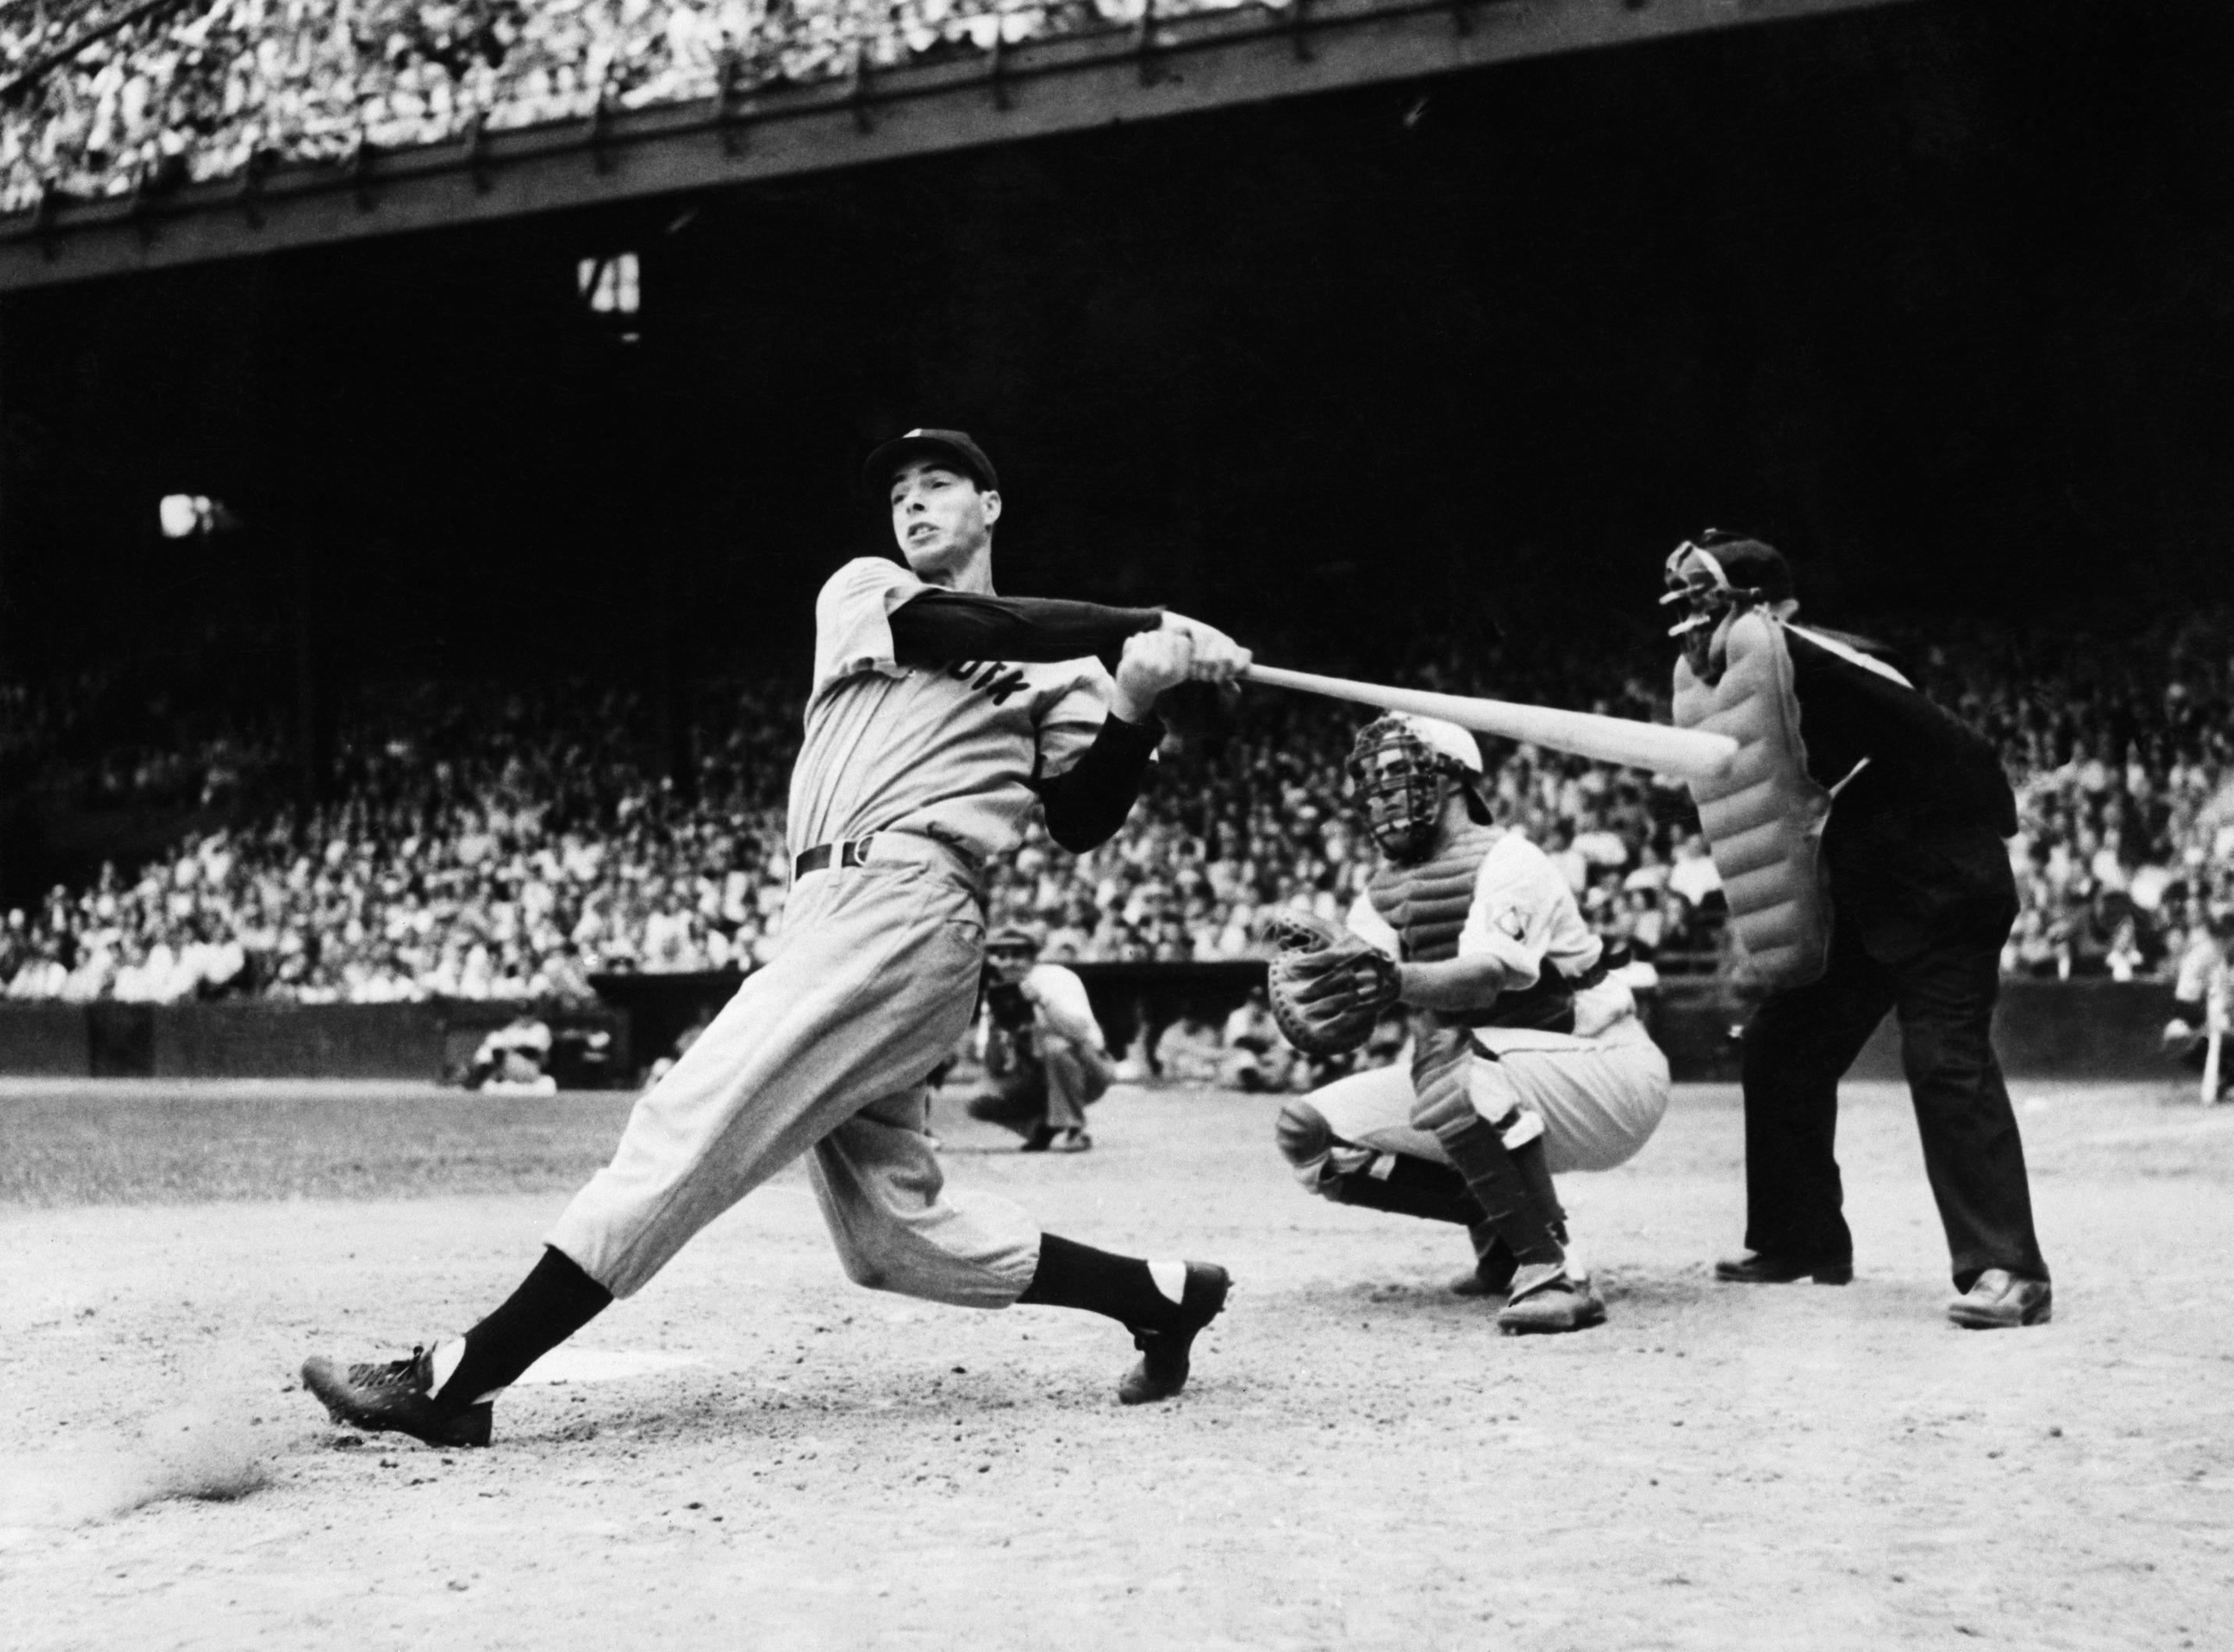 Joe DiMaggio Hitting a Home Run